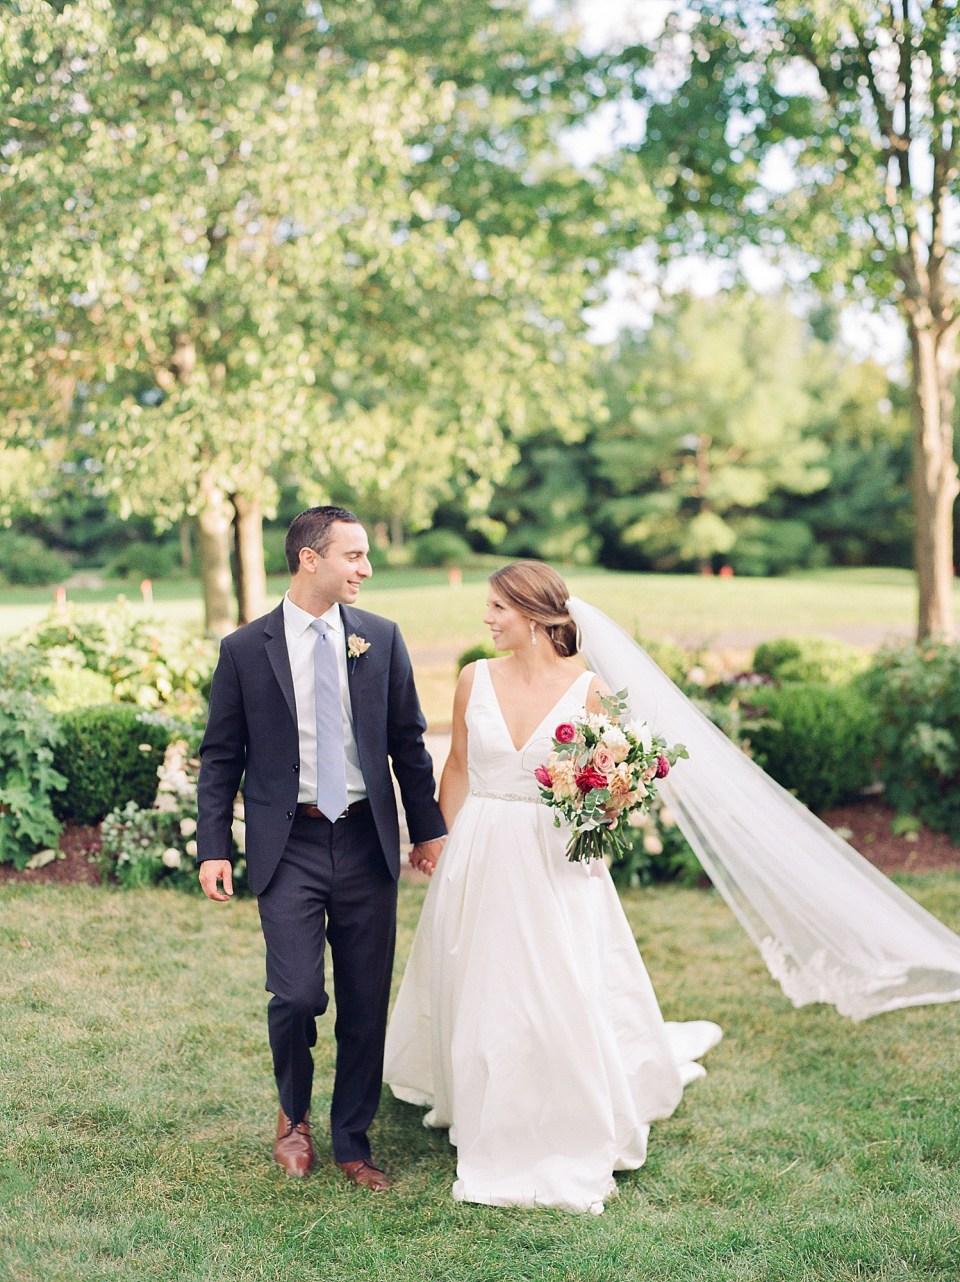 Princeton New Jersey Film Wedding Photographer Princeton University Wedding Photography by Magdalena Studios NJ Wedding Photographer43